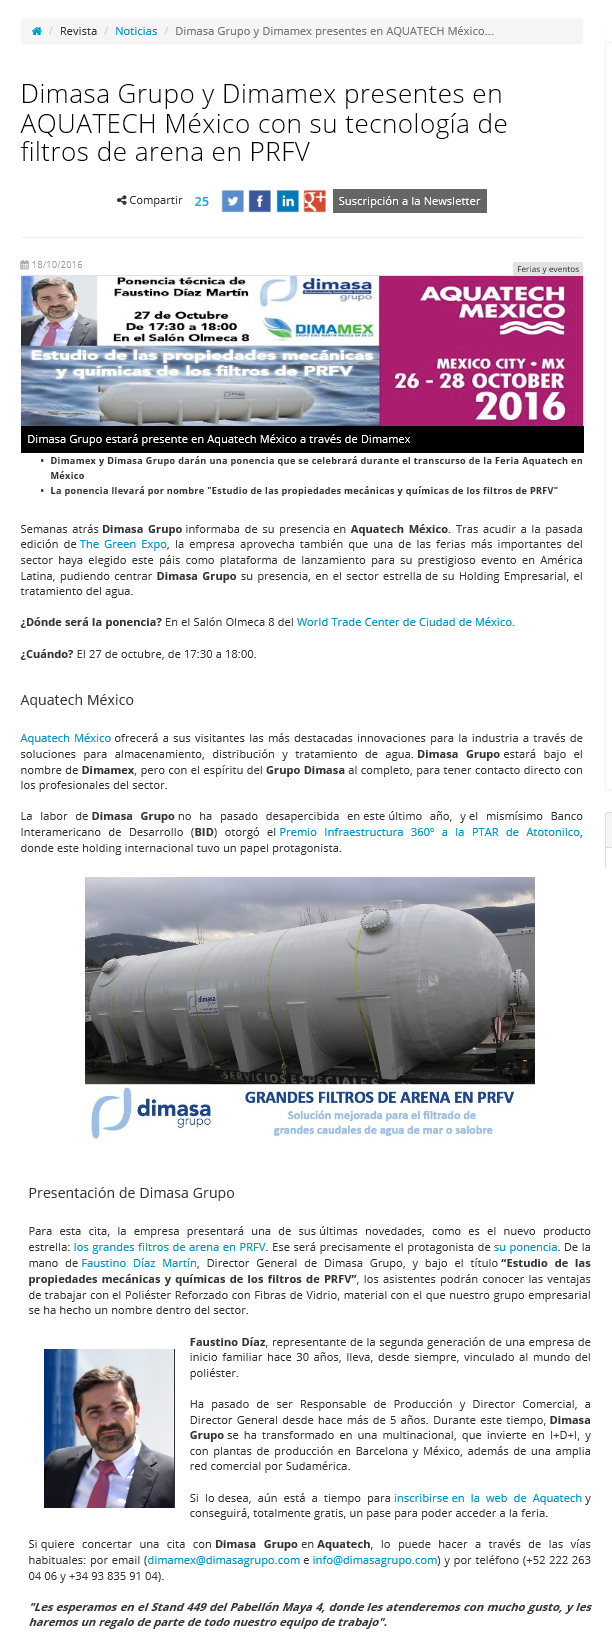 2016-10-18-aguasresiduales-info